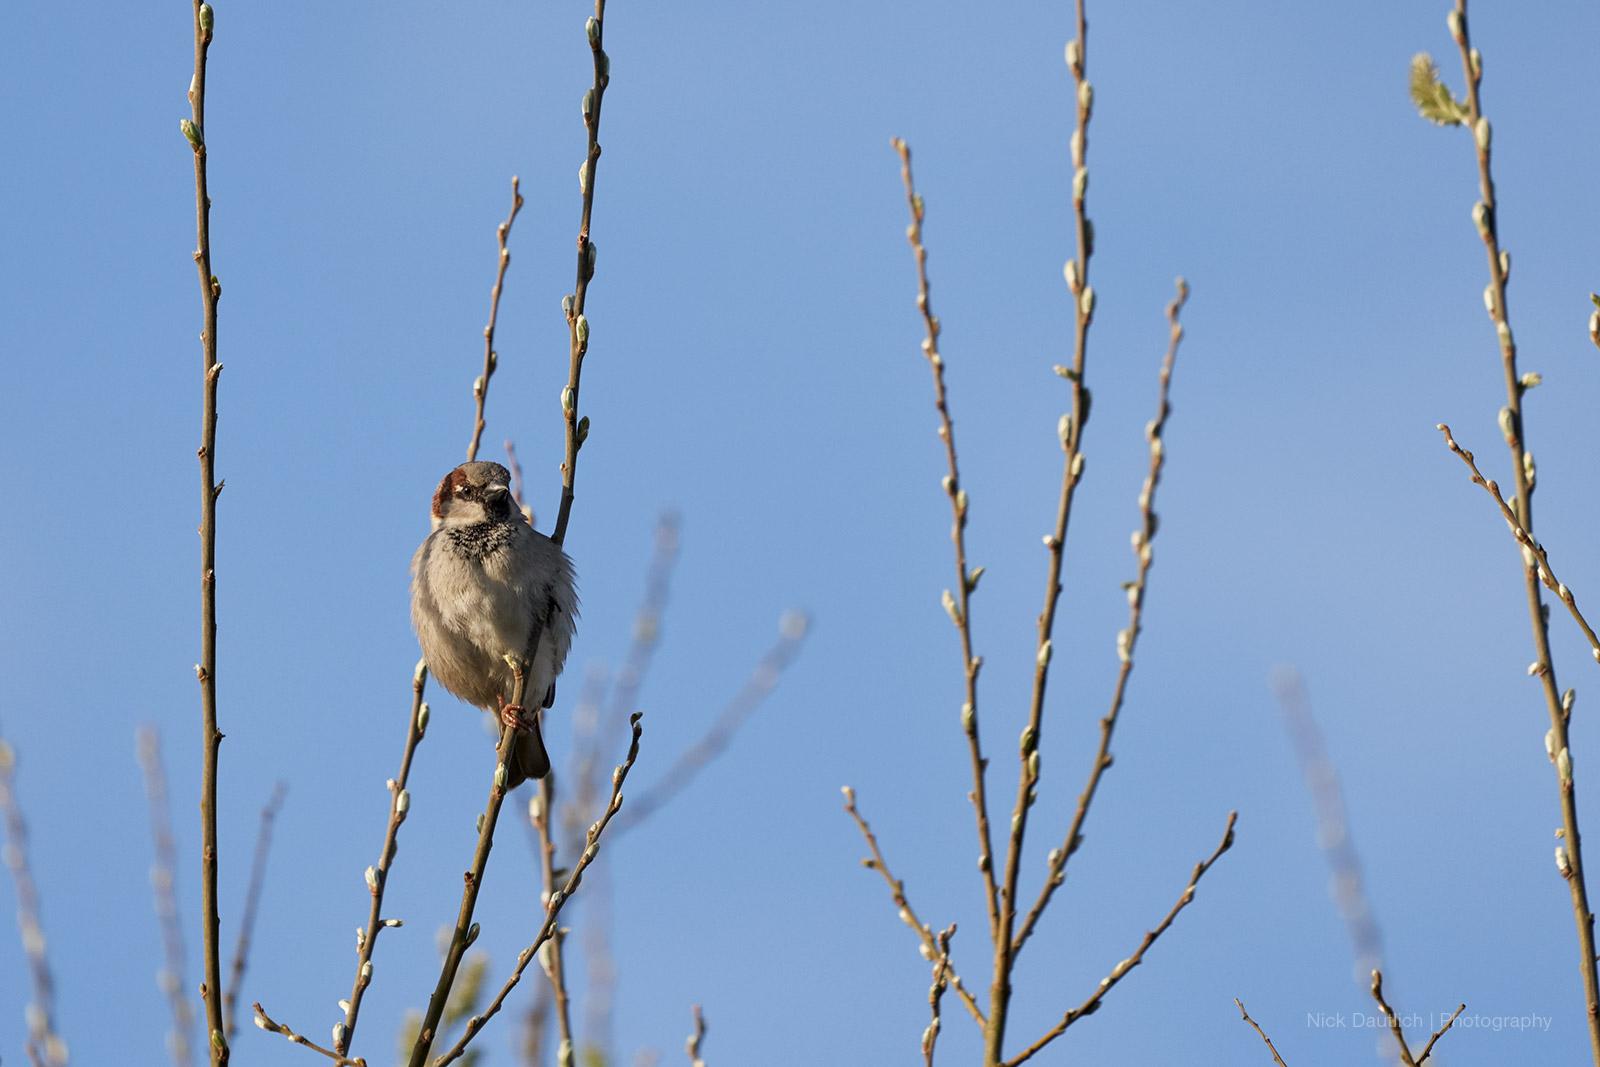 Garden sparrow at sunrise